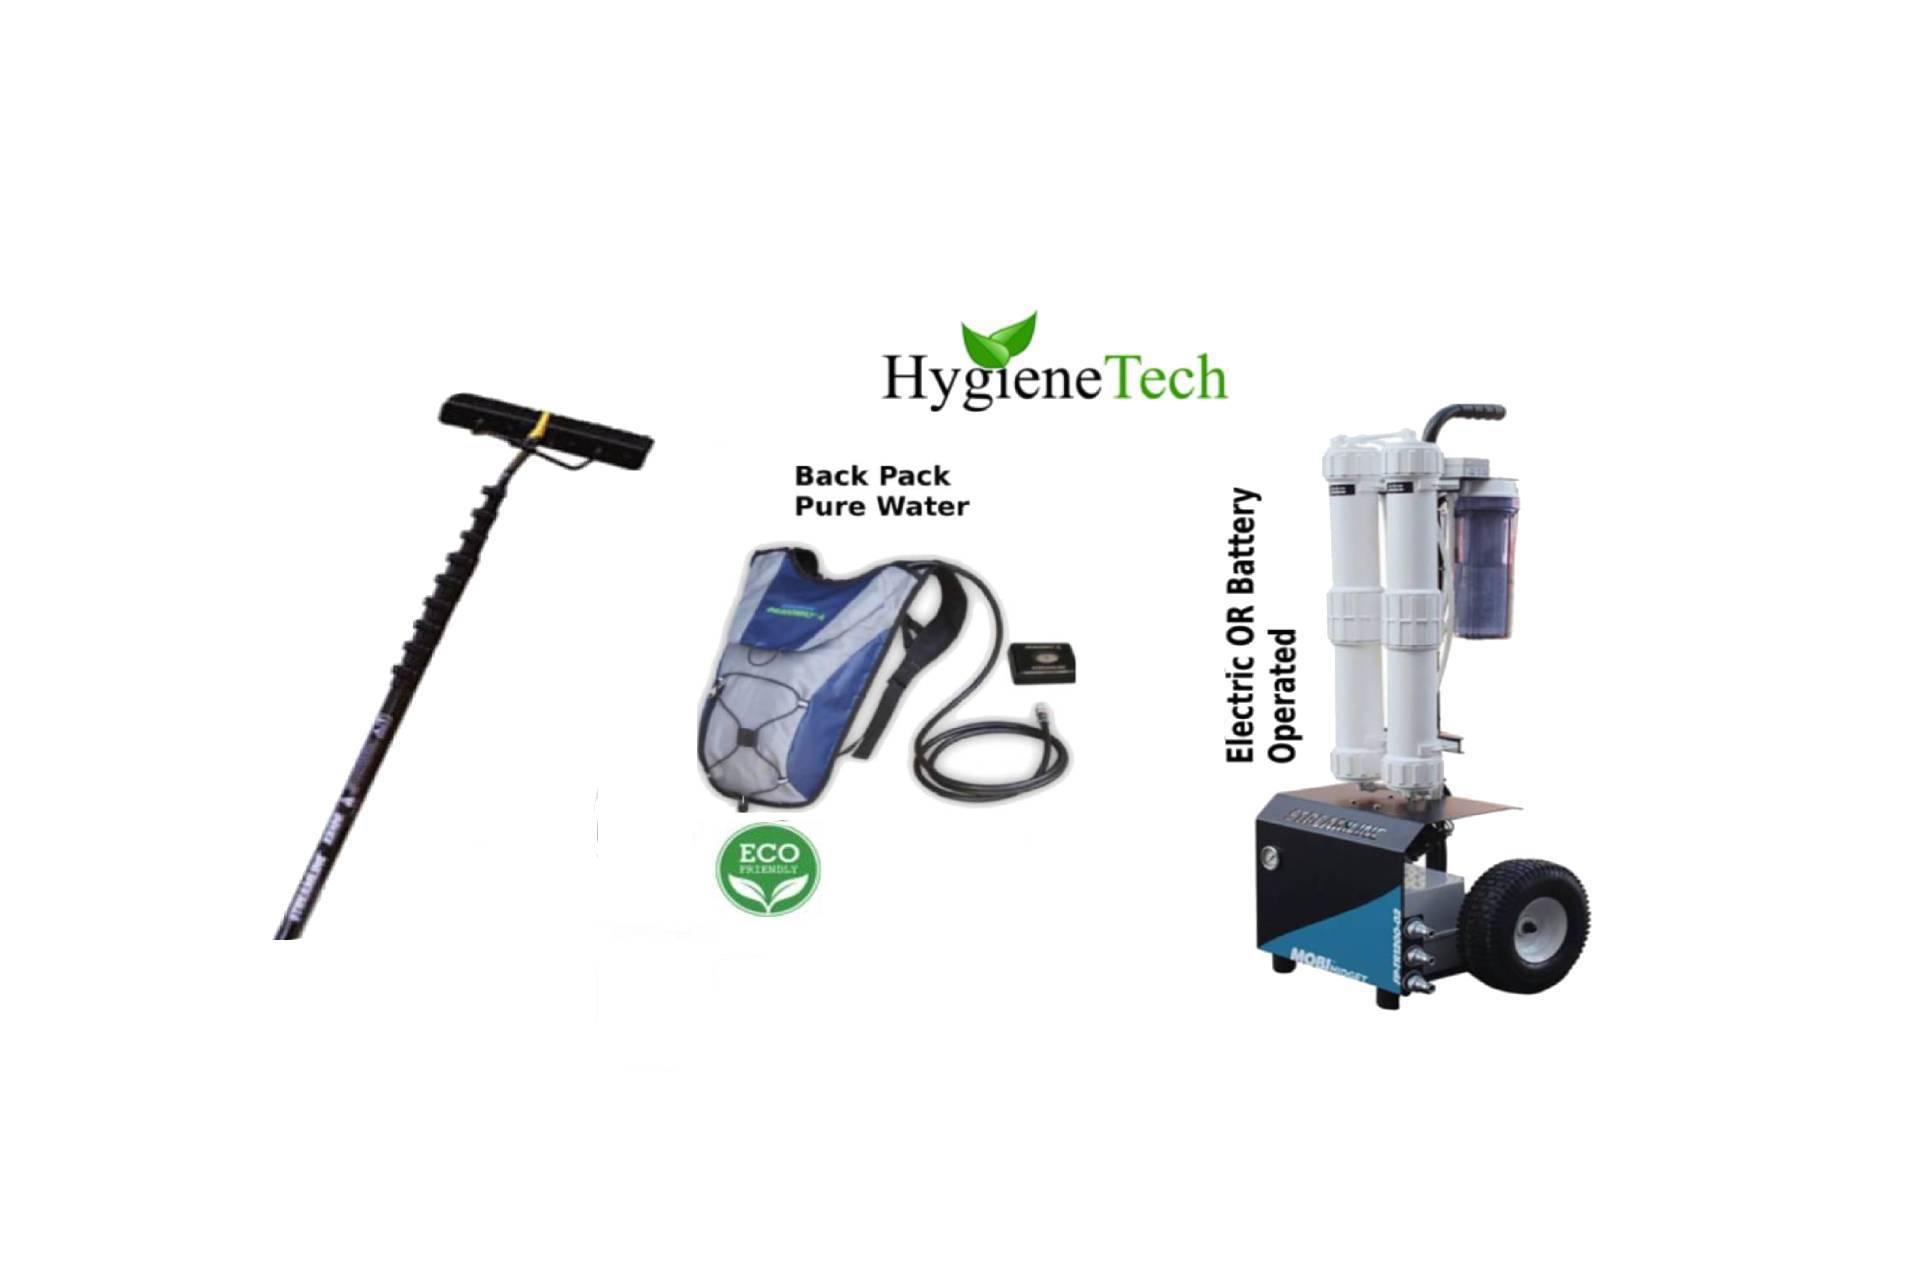 Hygiene Tech